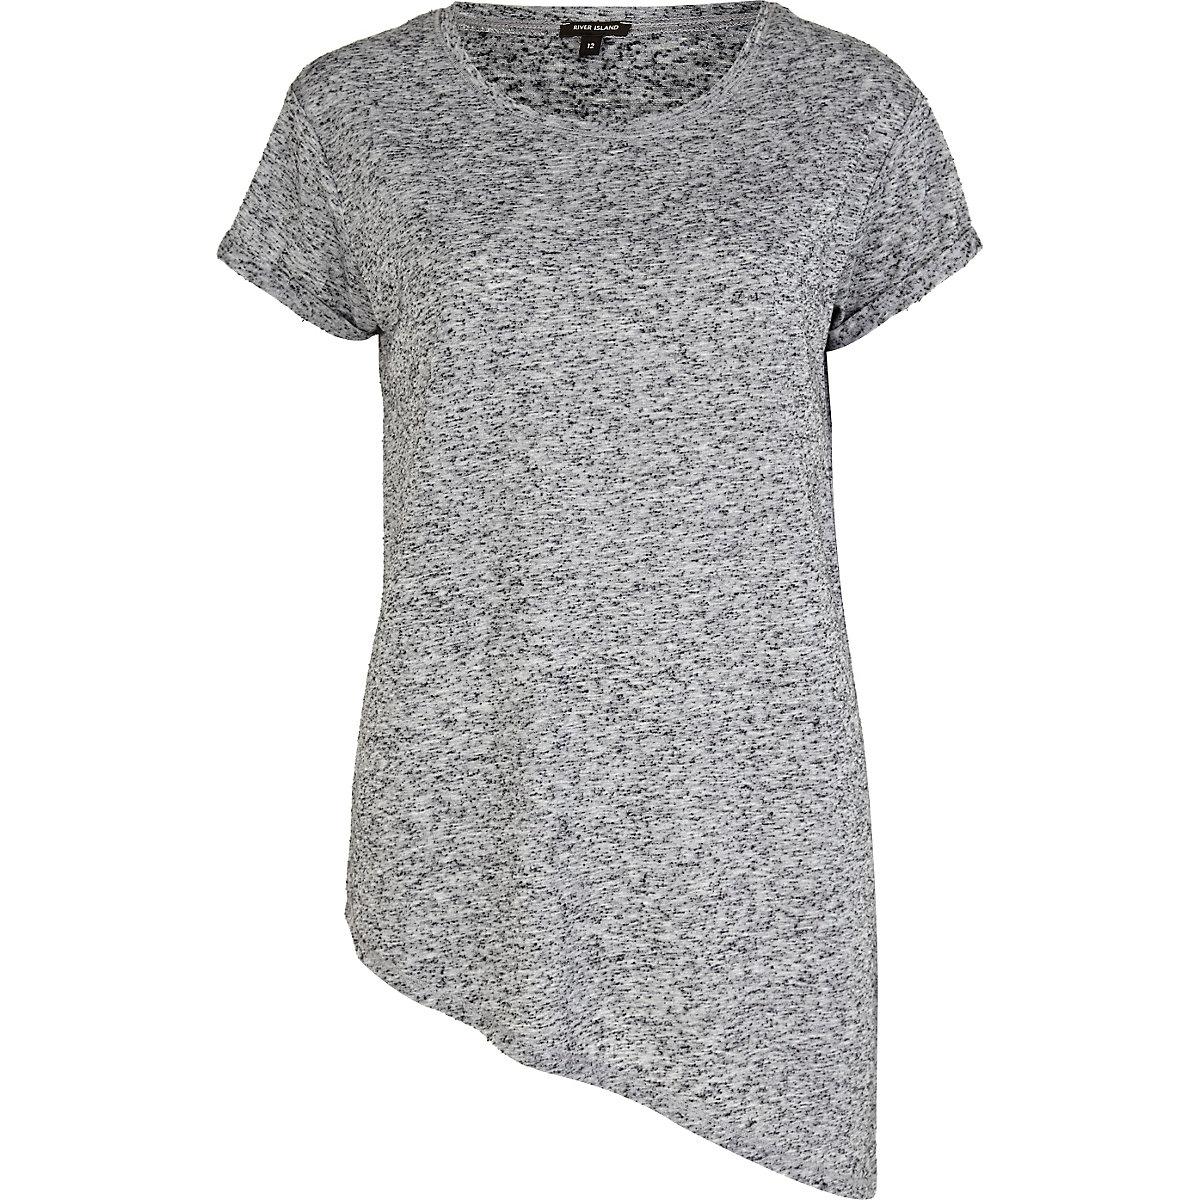 Grey marl asymmetric t-shirt